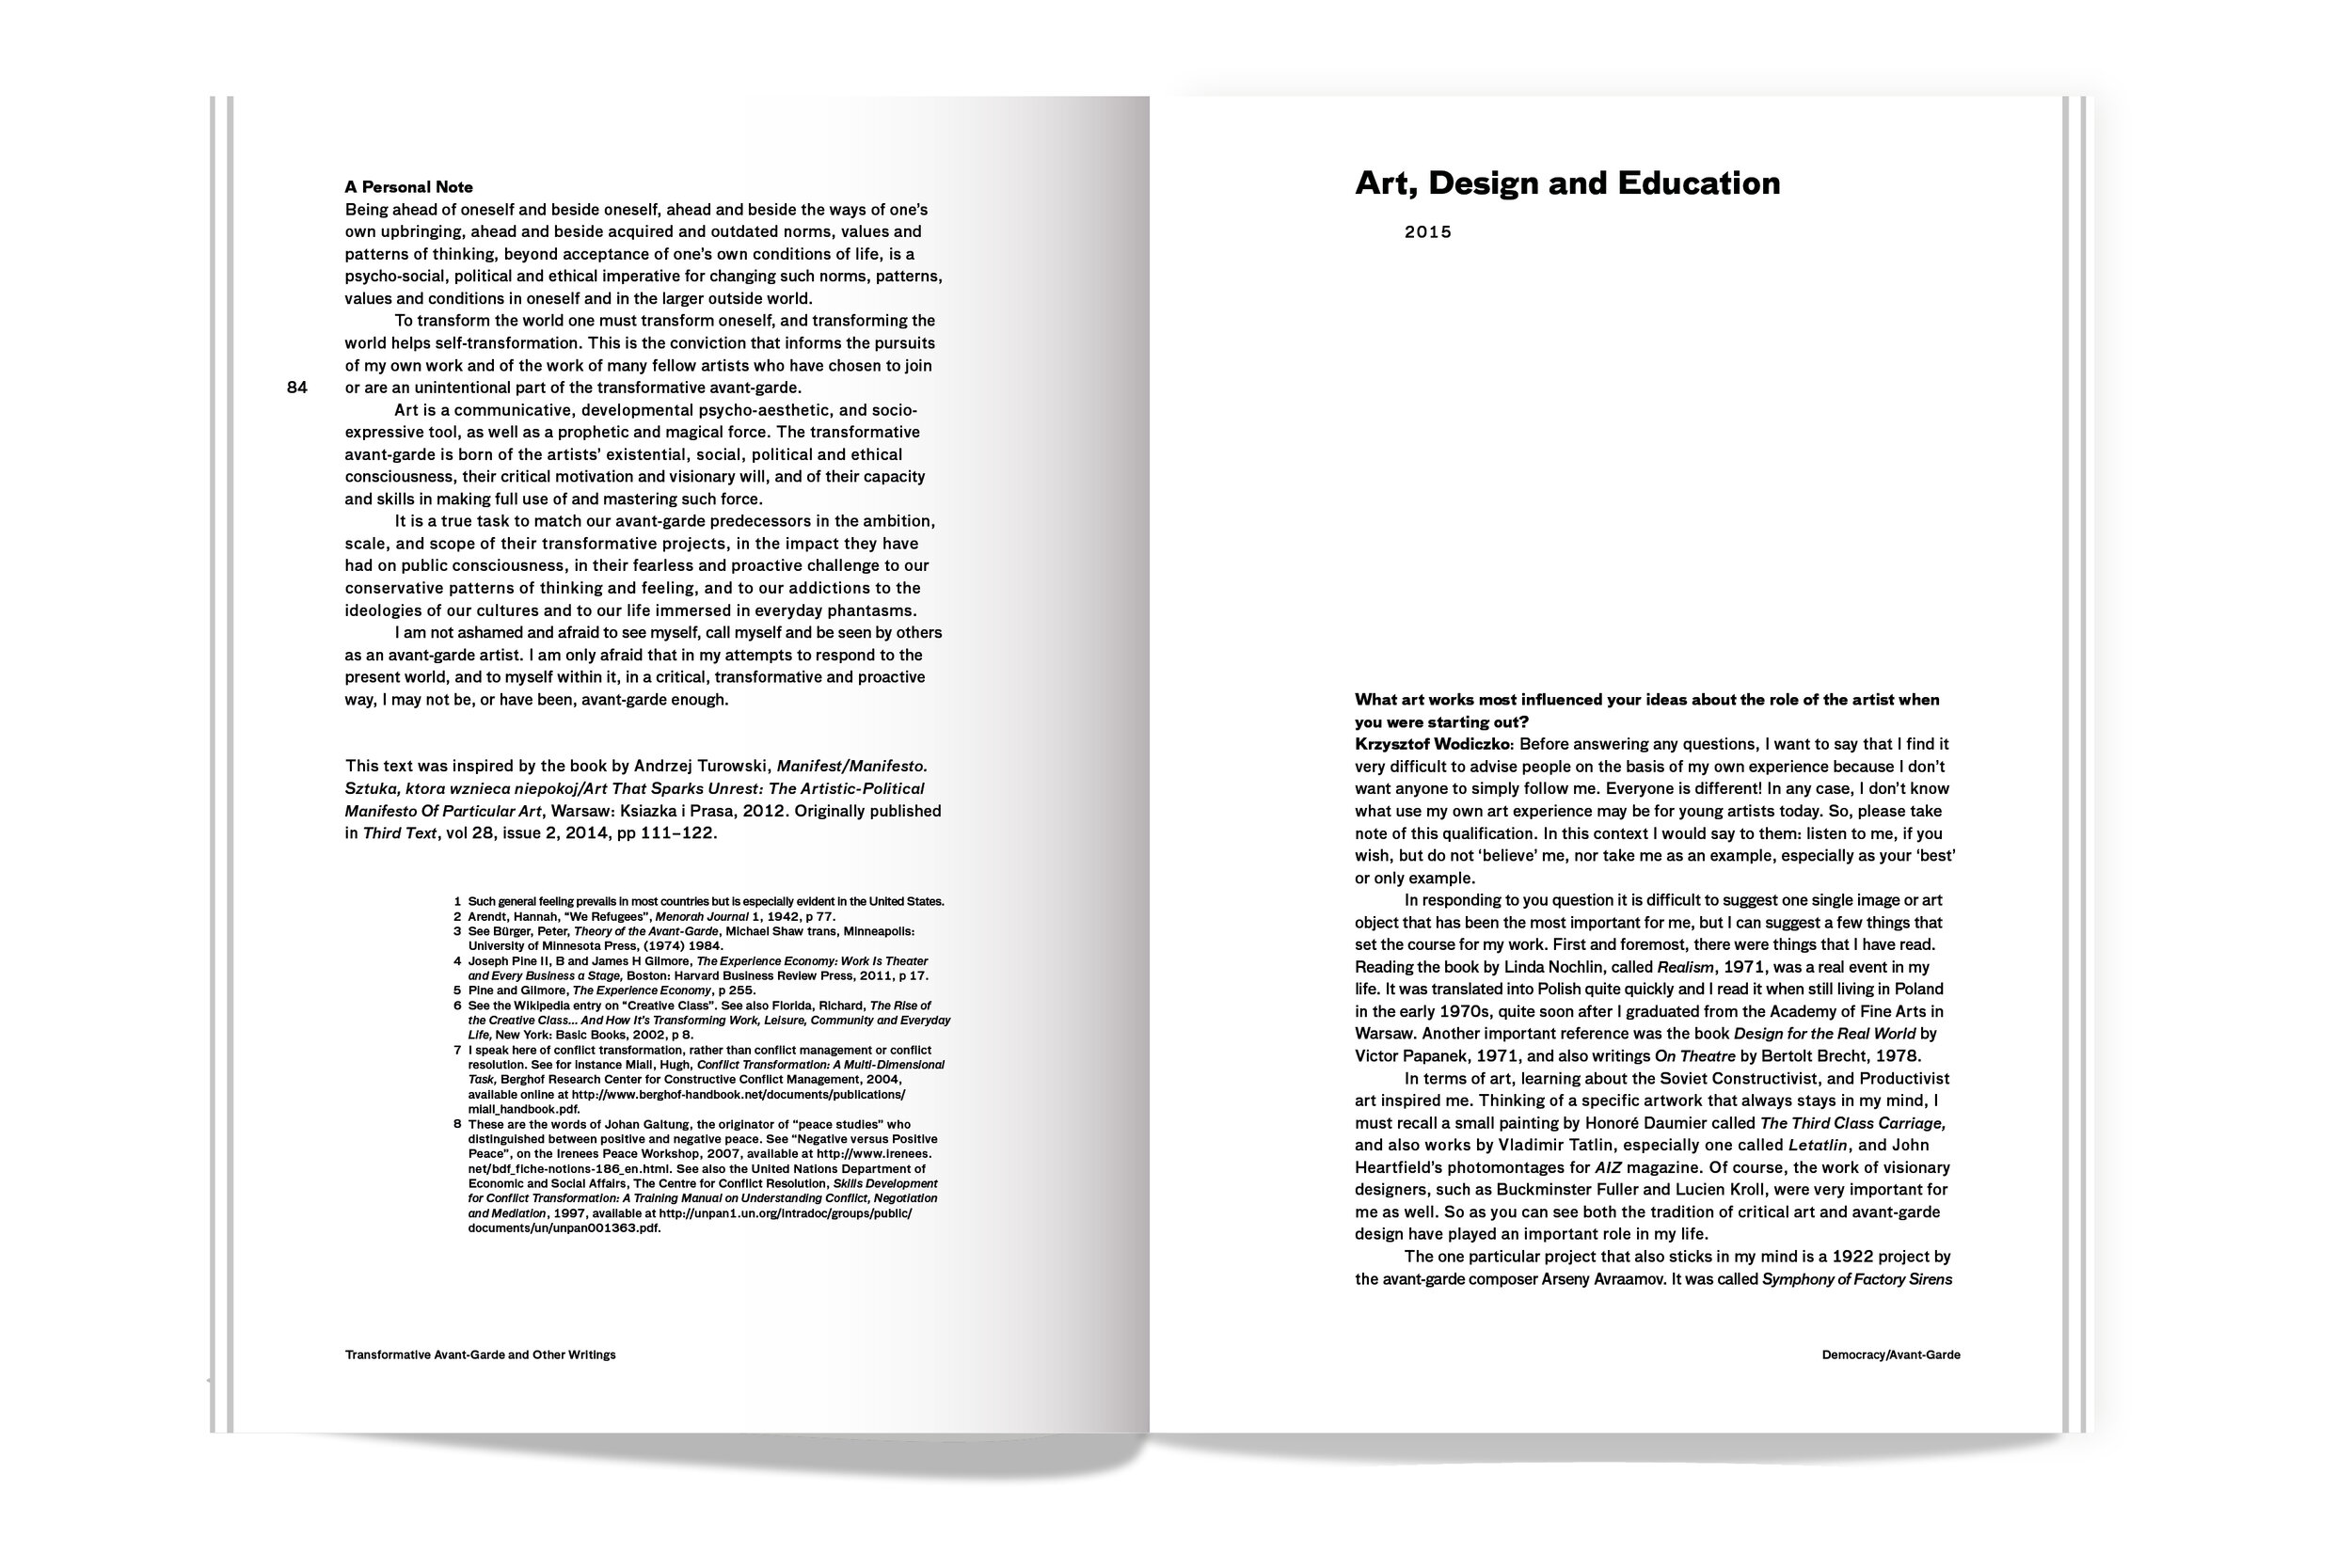 BDP_Transformative Avant-Garde & Other Writings_Inners_V2-005.jpg